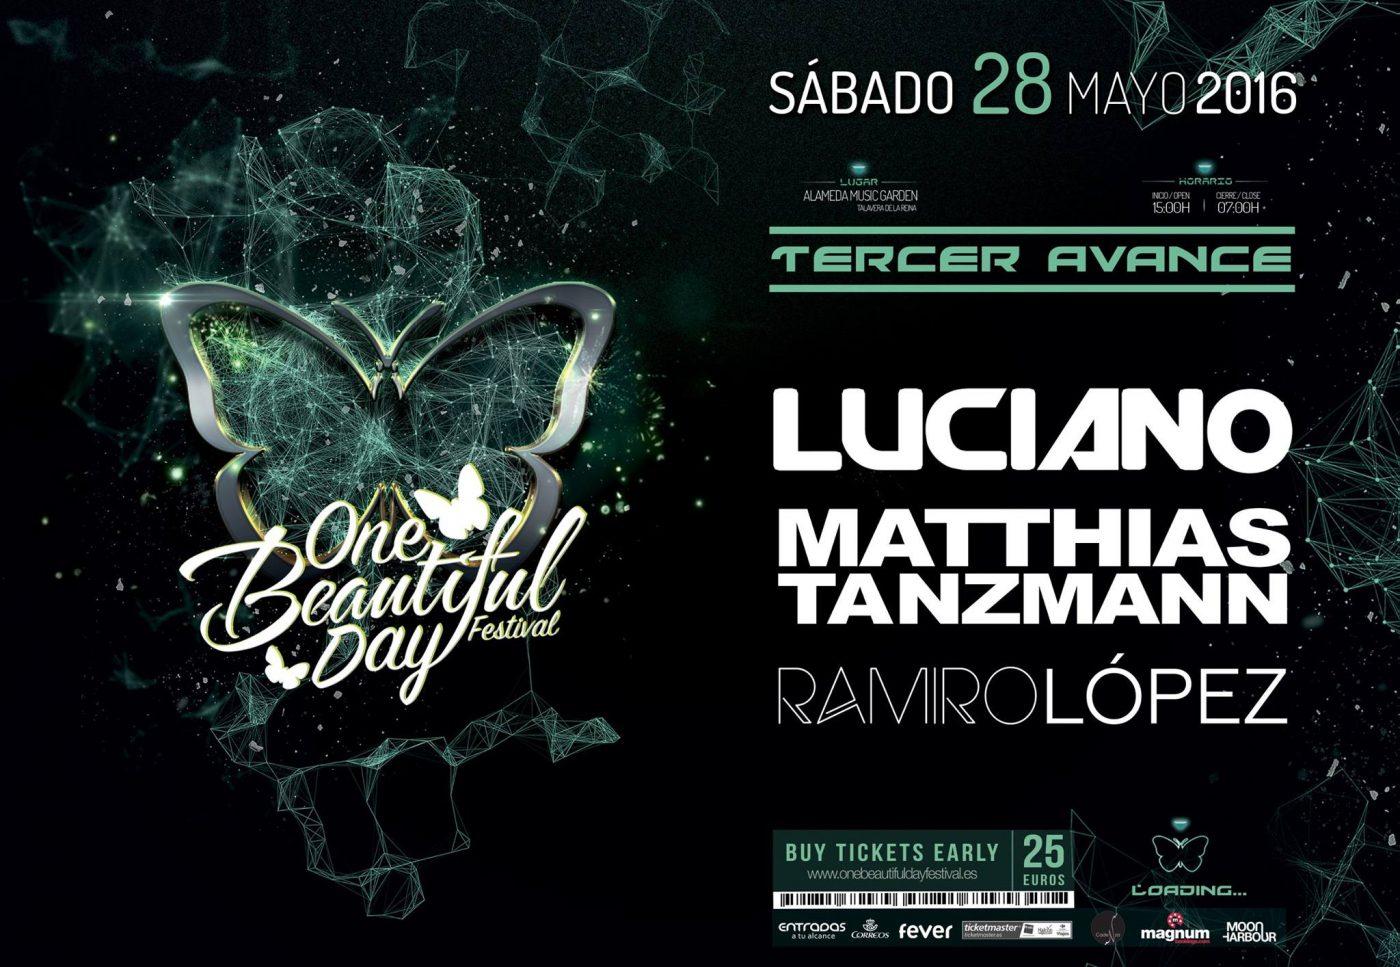 Luciano-EDMred Sorteo One Beautiful Day Festival de Talavera de la Reina